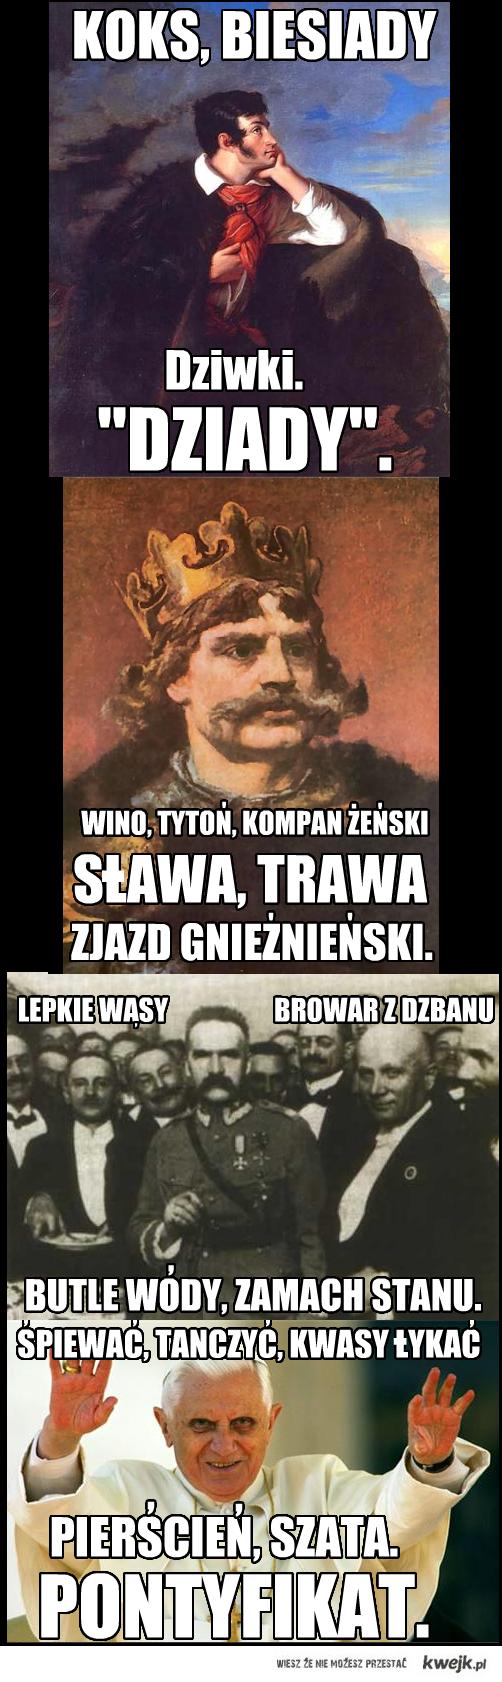 ZNOWU!?